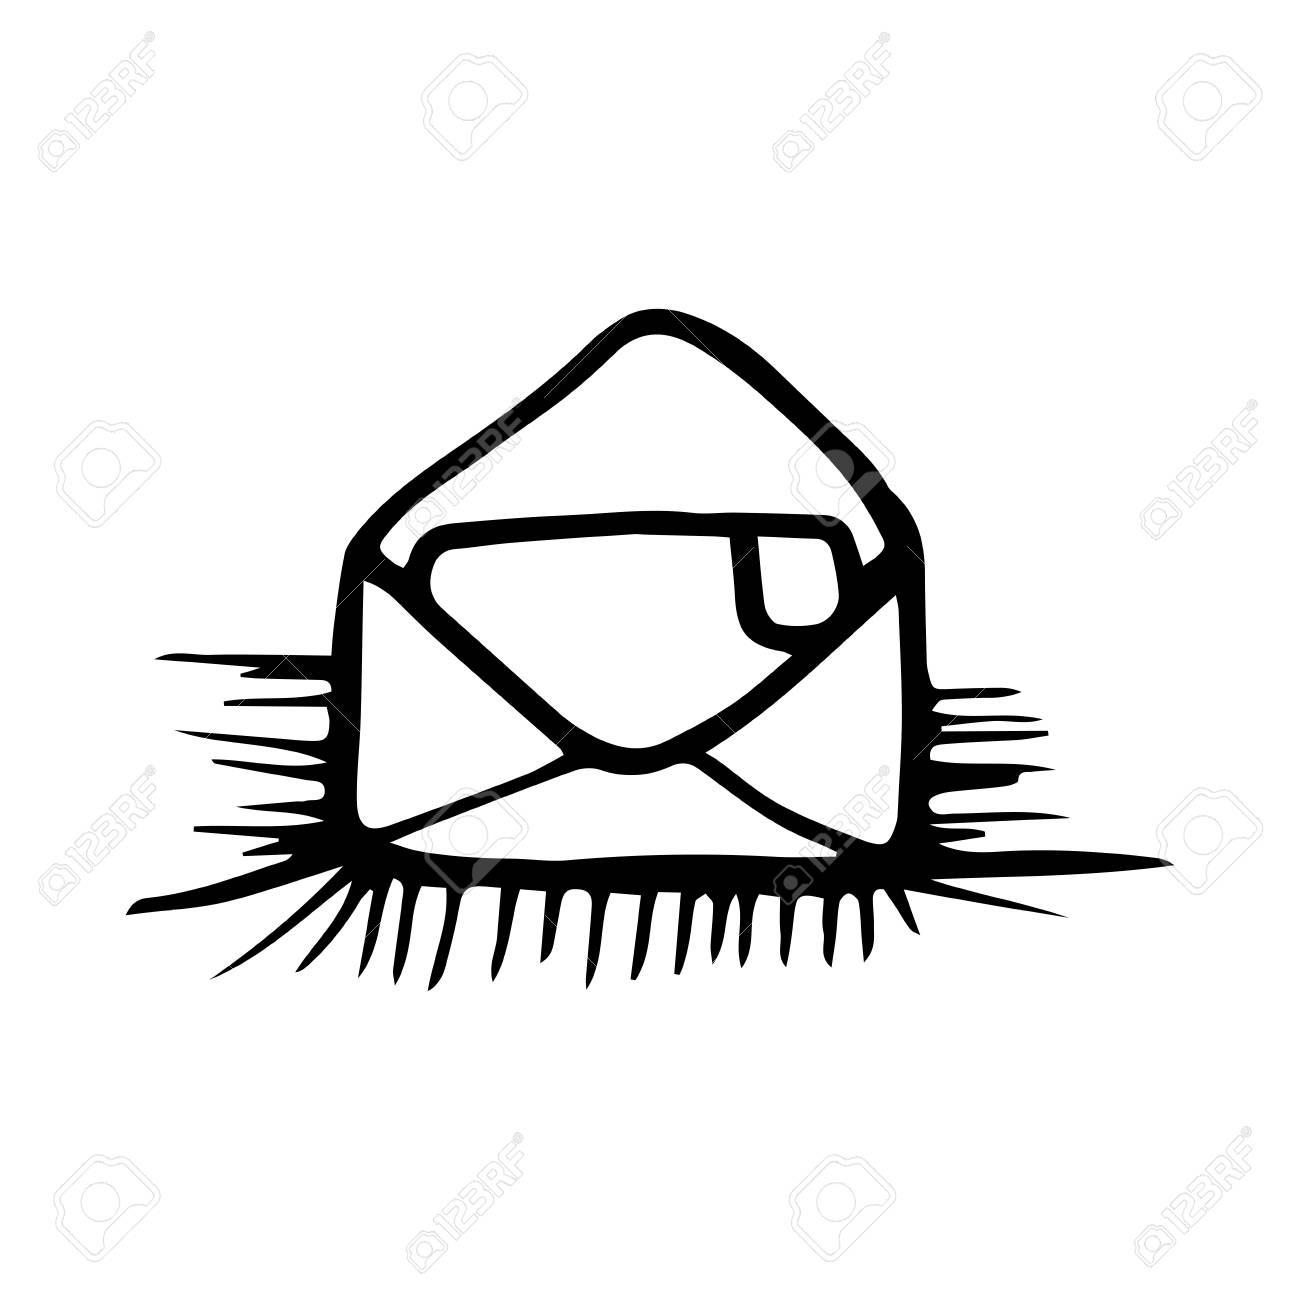 Open Envelope Mail Letter Drawn Design Vector Illustration Royalty